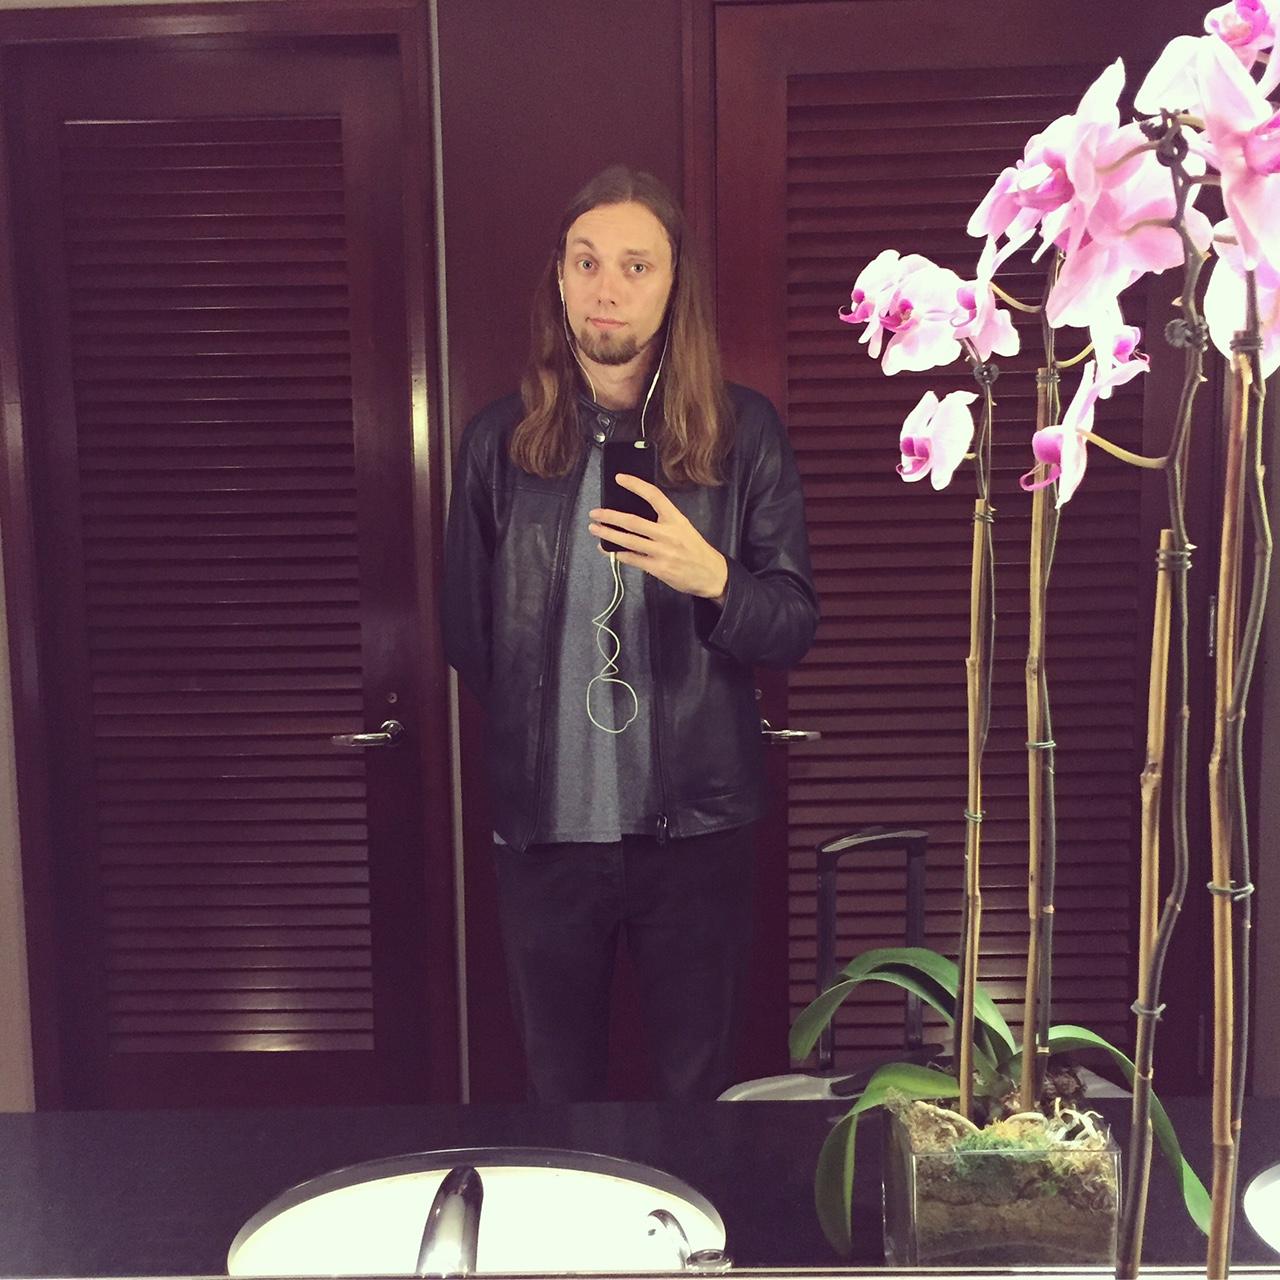 Lurking in Hotel Bathrooms